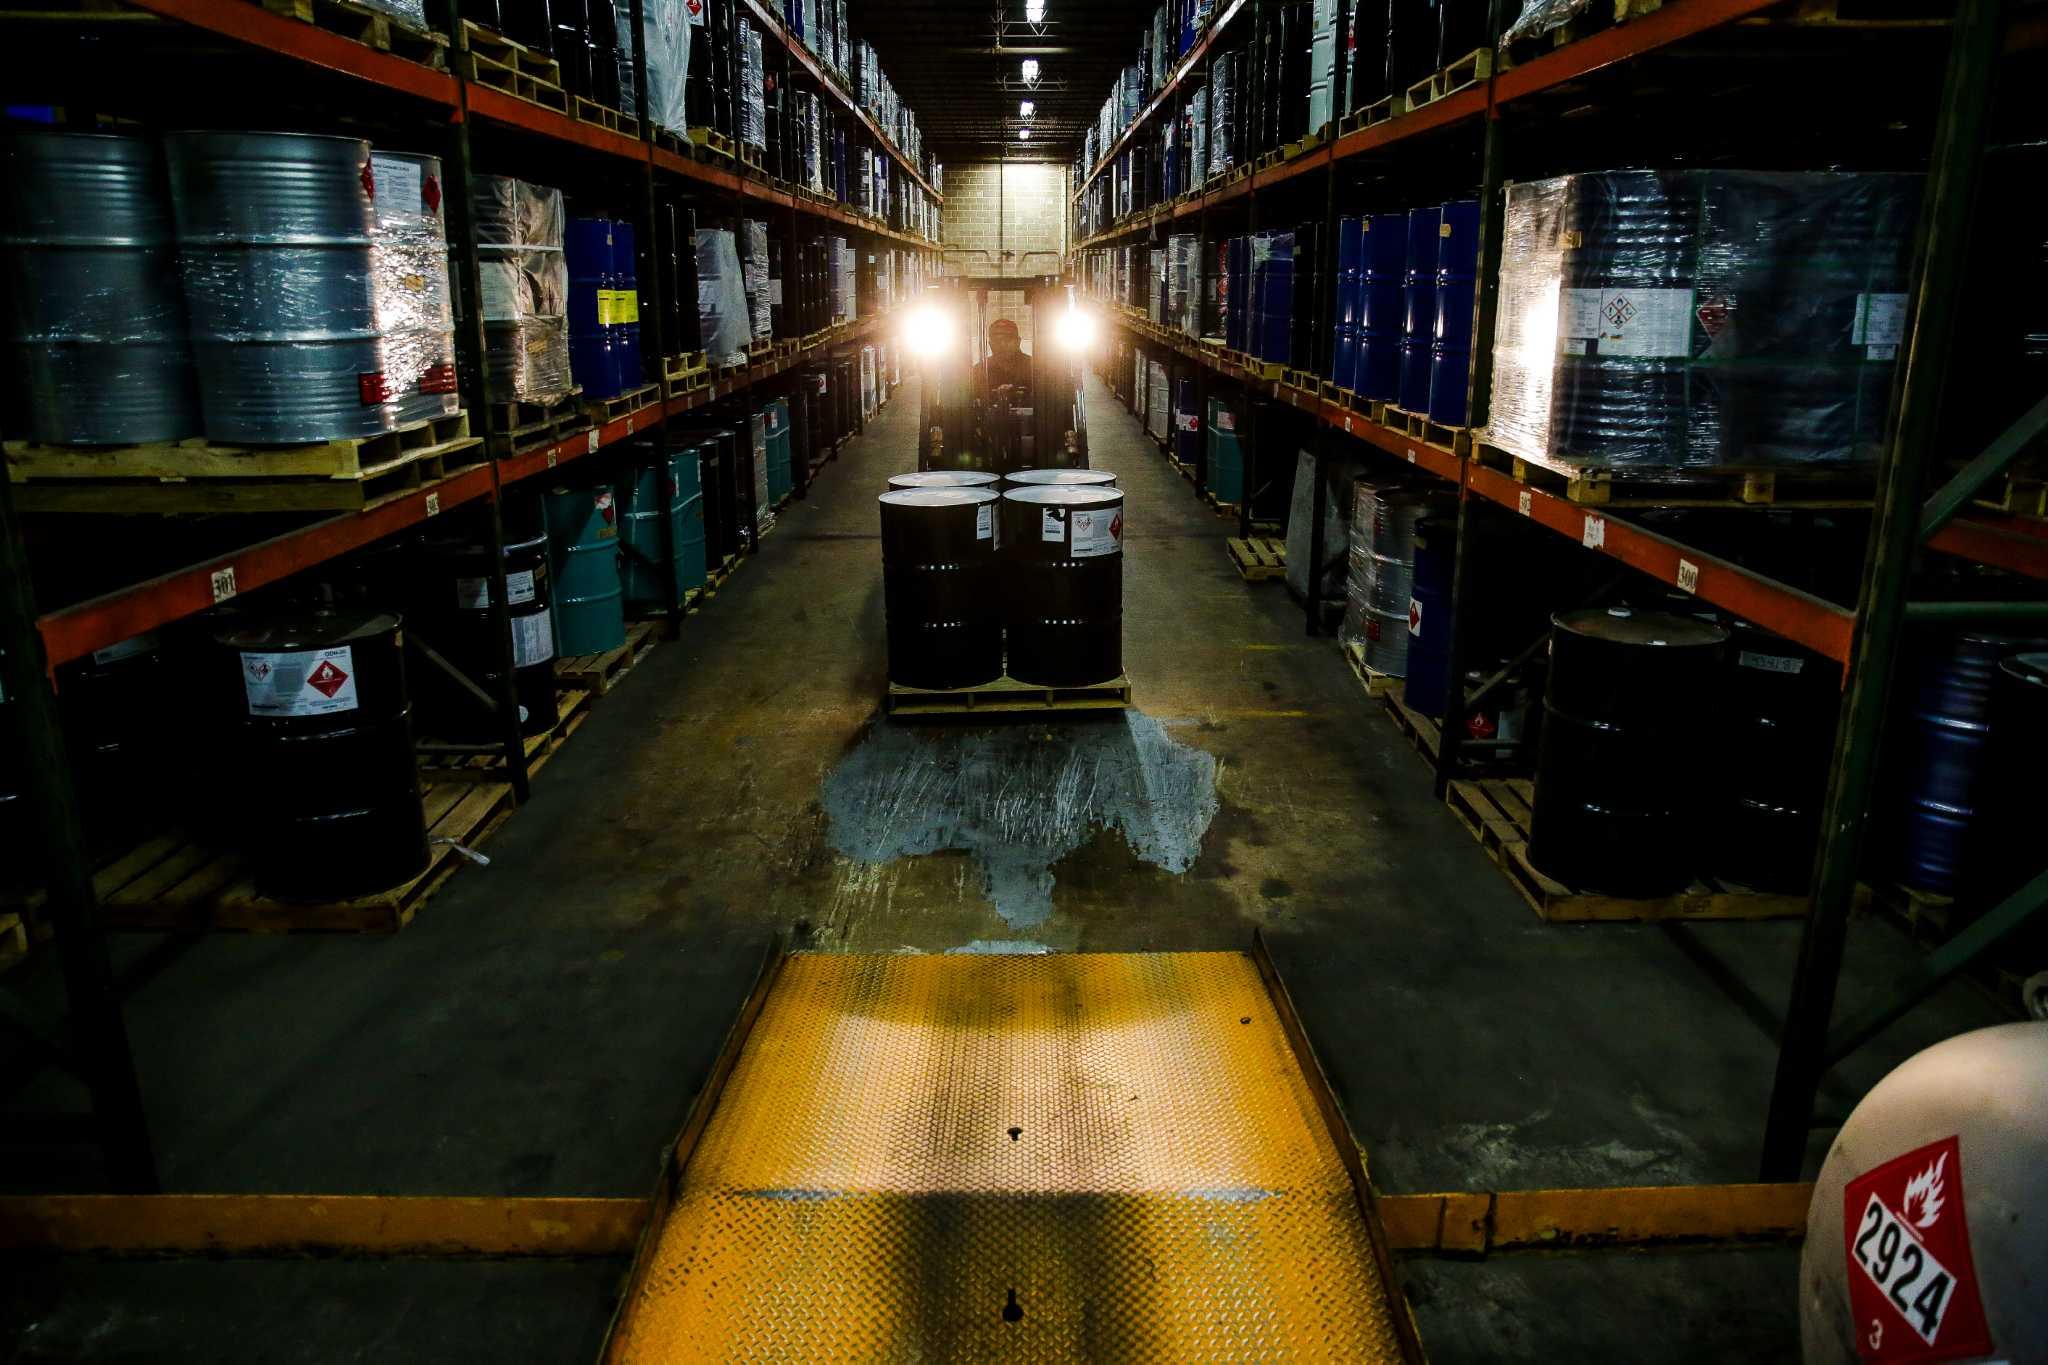 Dangerous chemicals, roadblocks to information combine to